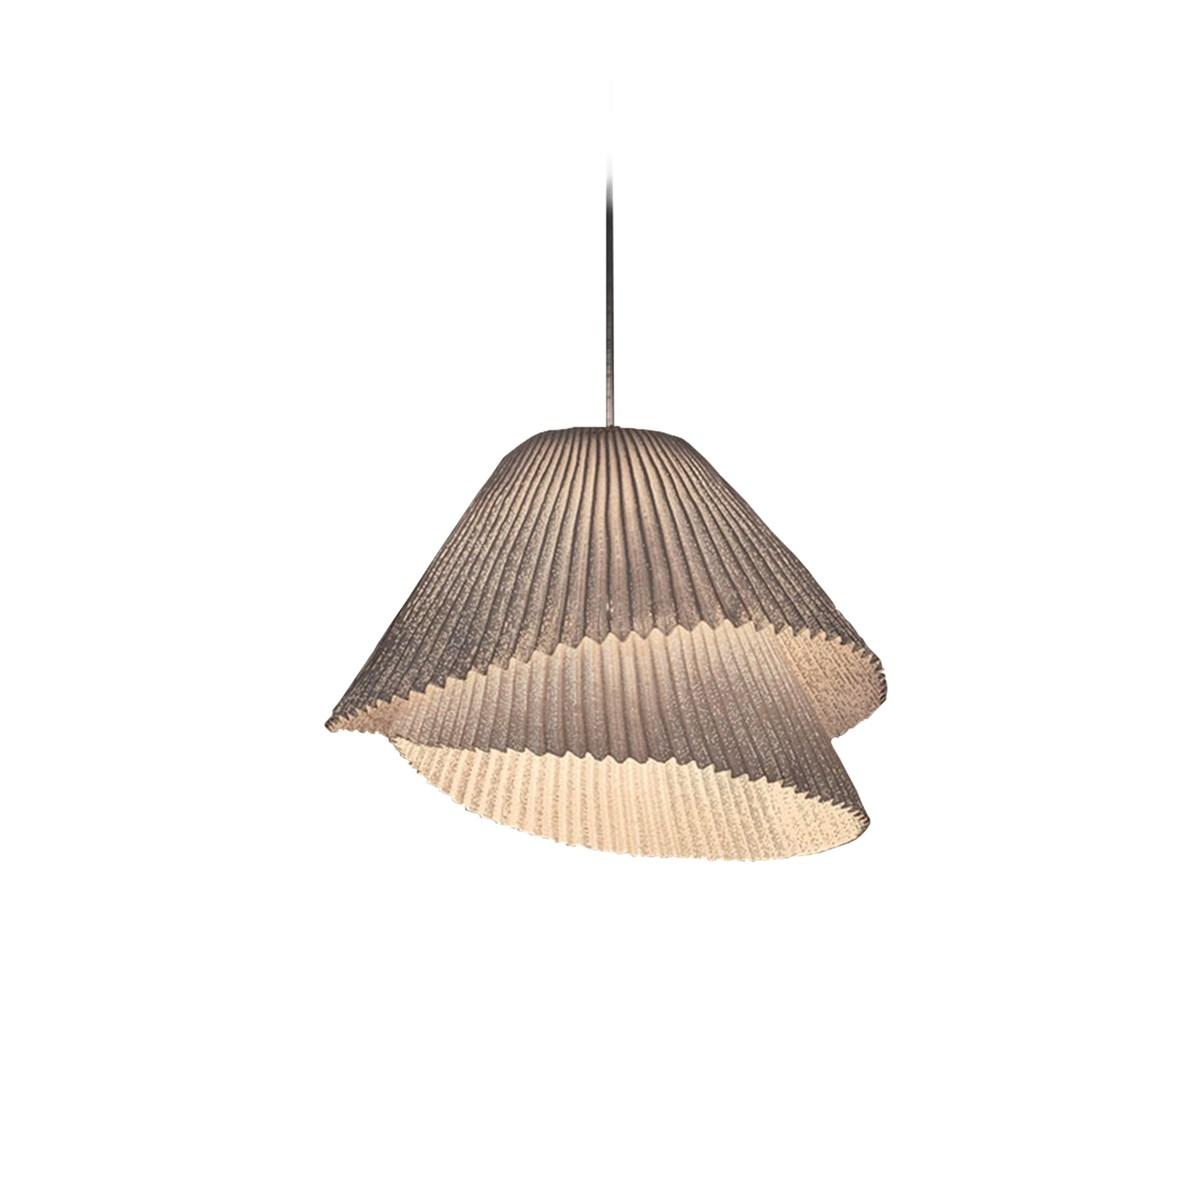 Arturo-Alvarez-Tempo-Vivace-Pendant-Light-Matisse-1 (1)